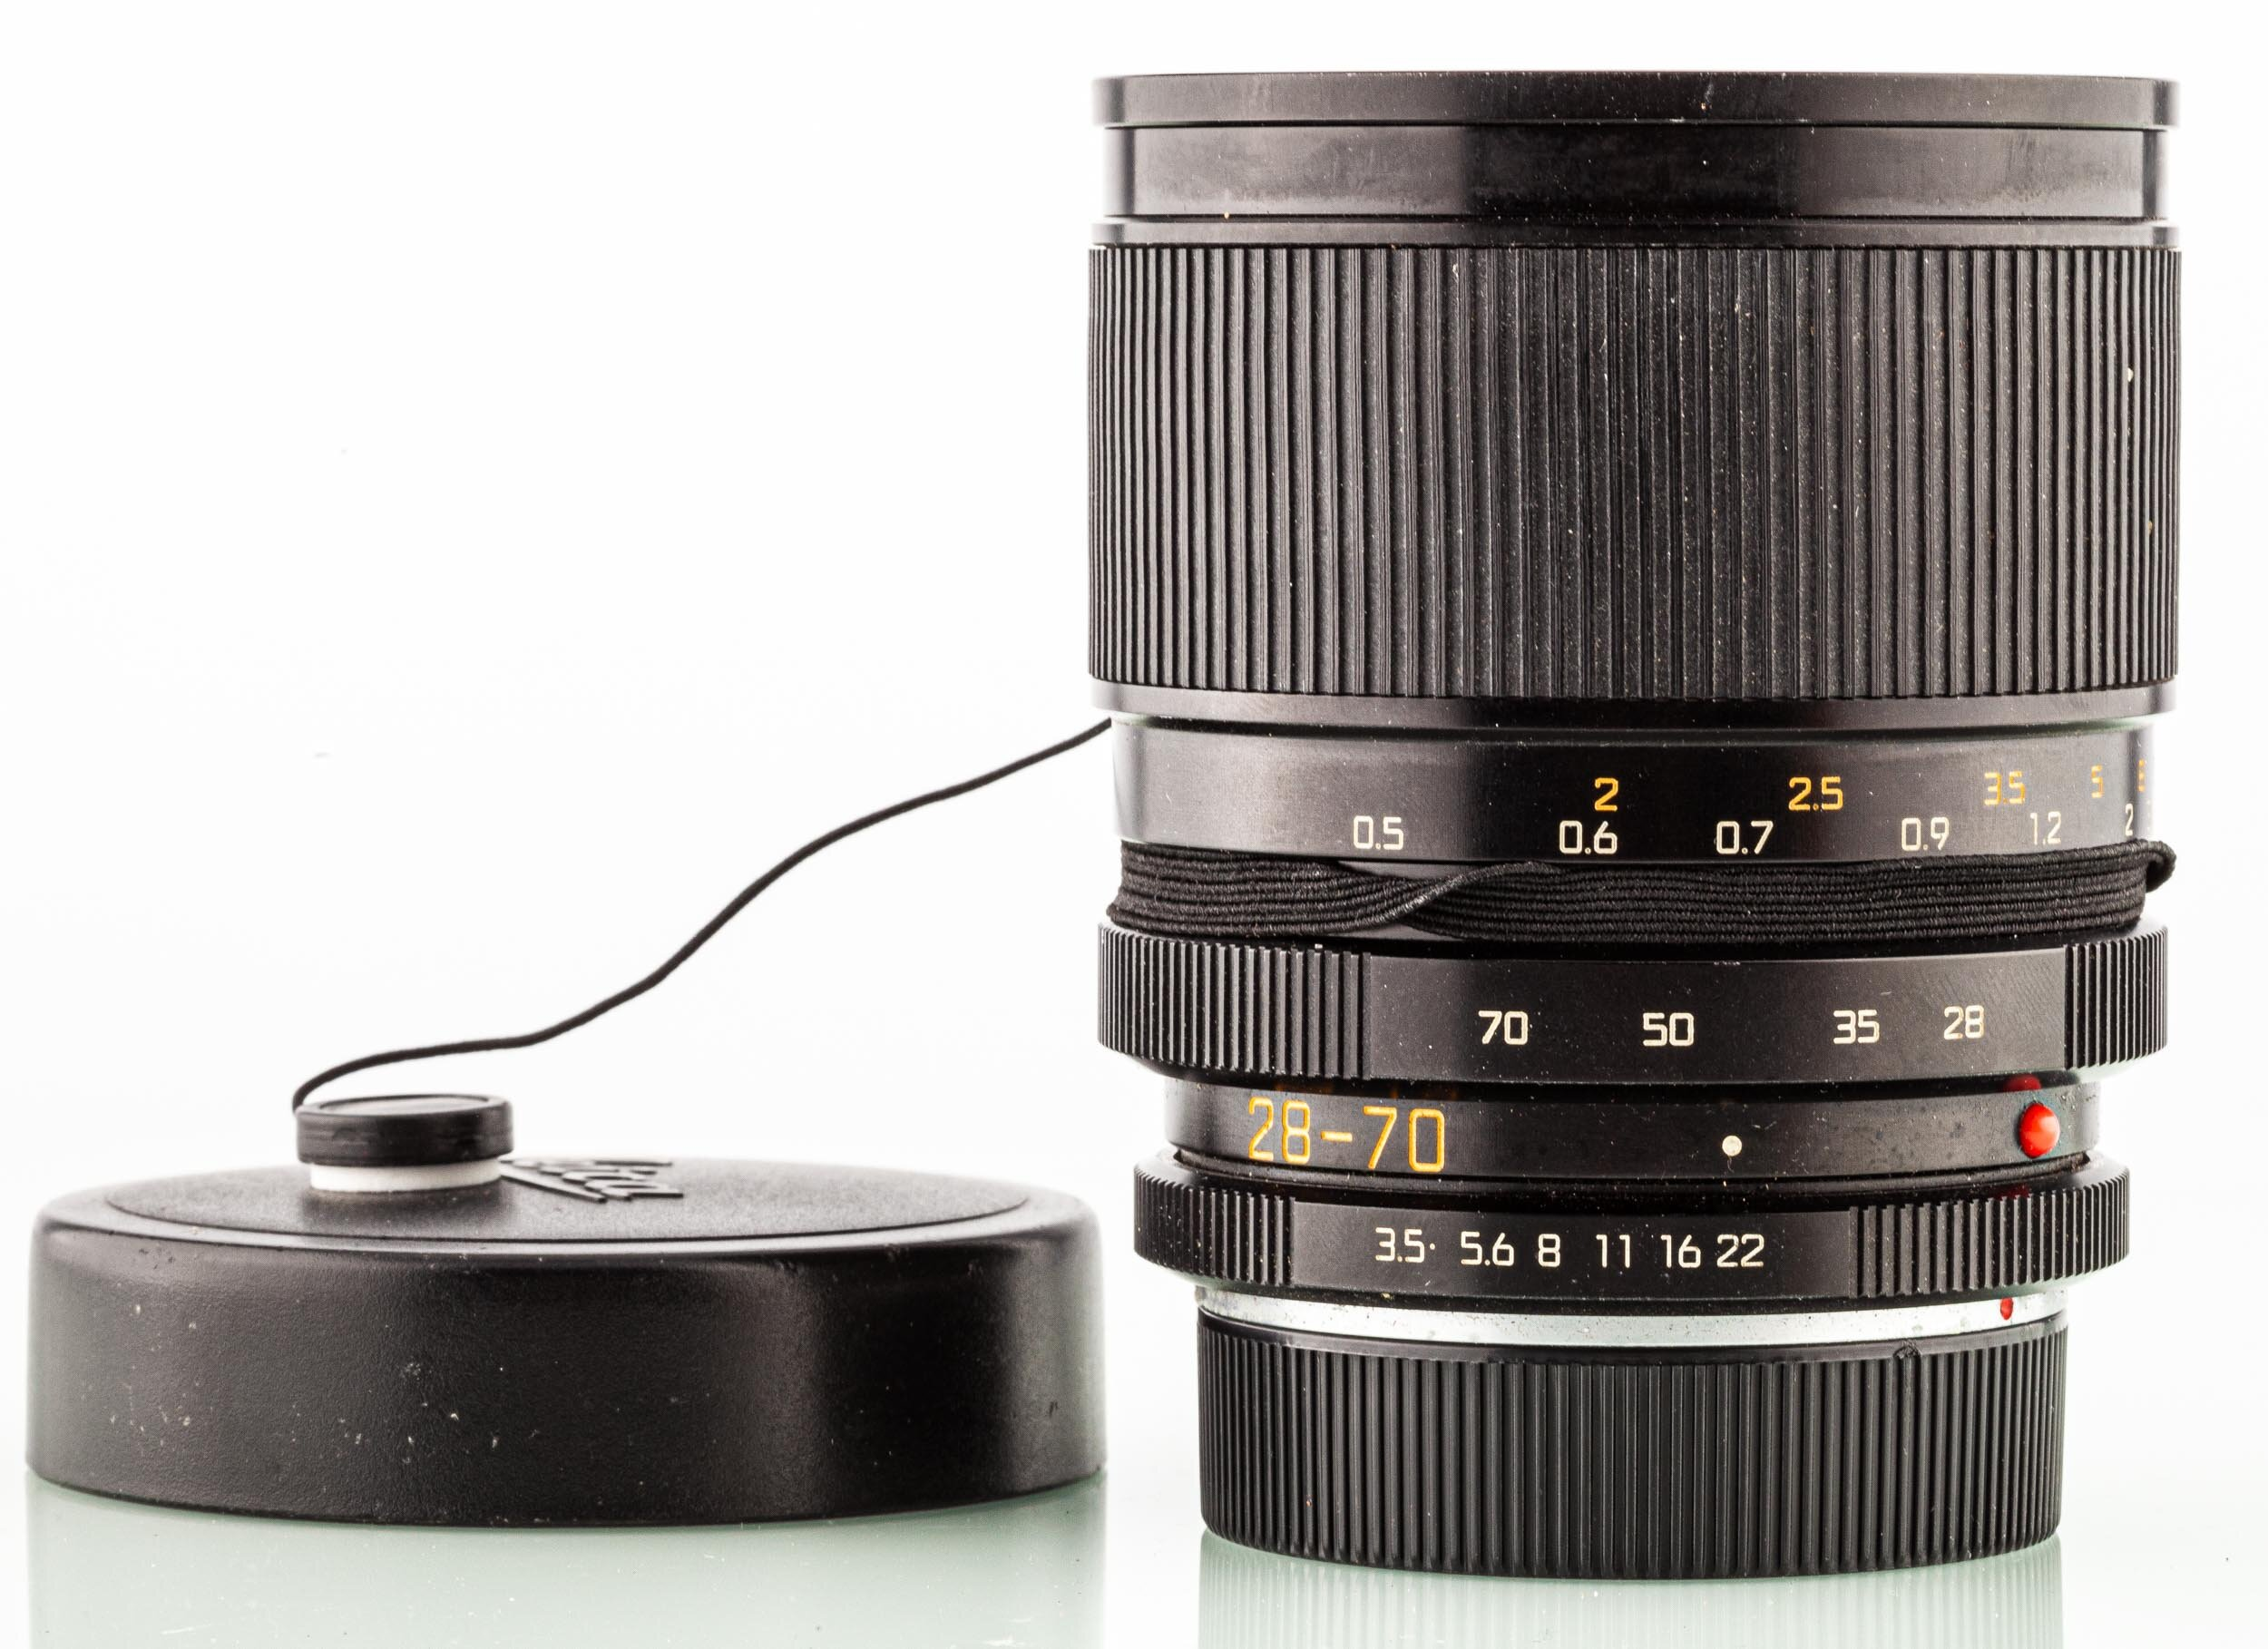 Leitz Leica R Vario Elmar 28-70mm F3.5-4.5 Black